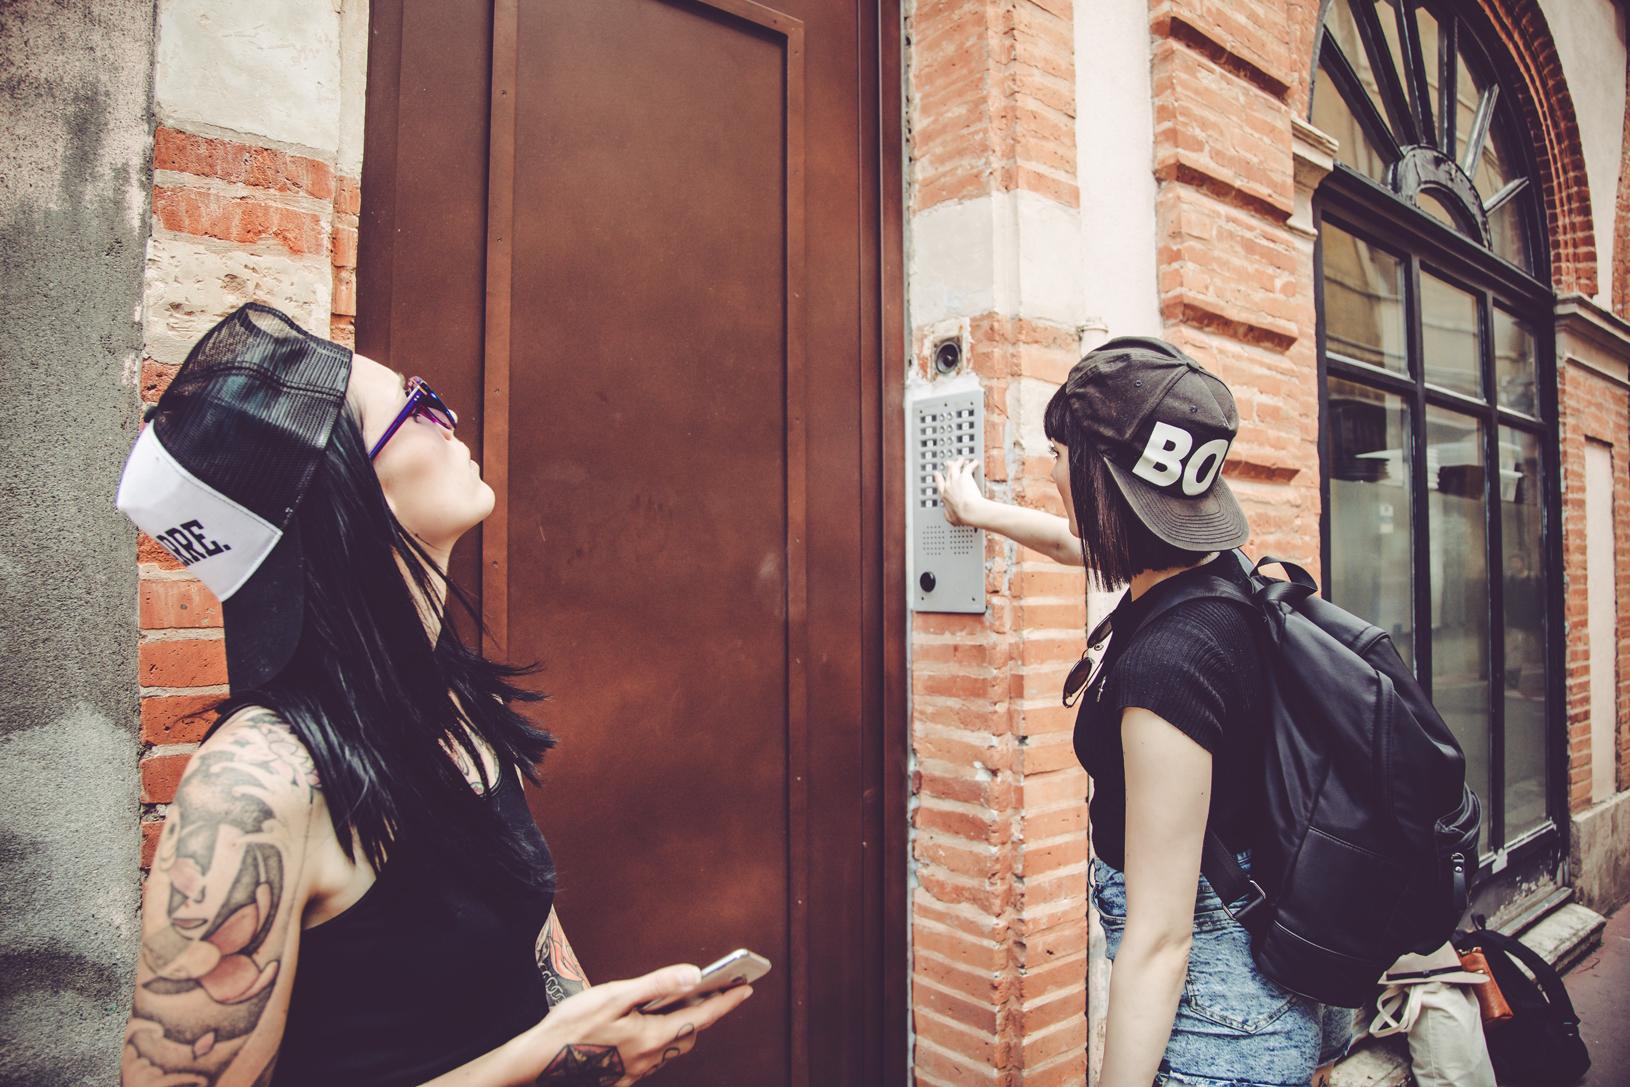 Two women ringing a doorbell.